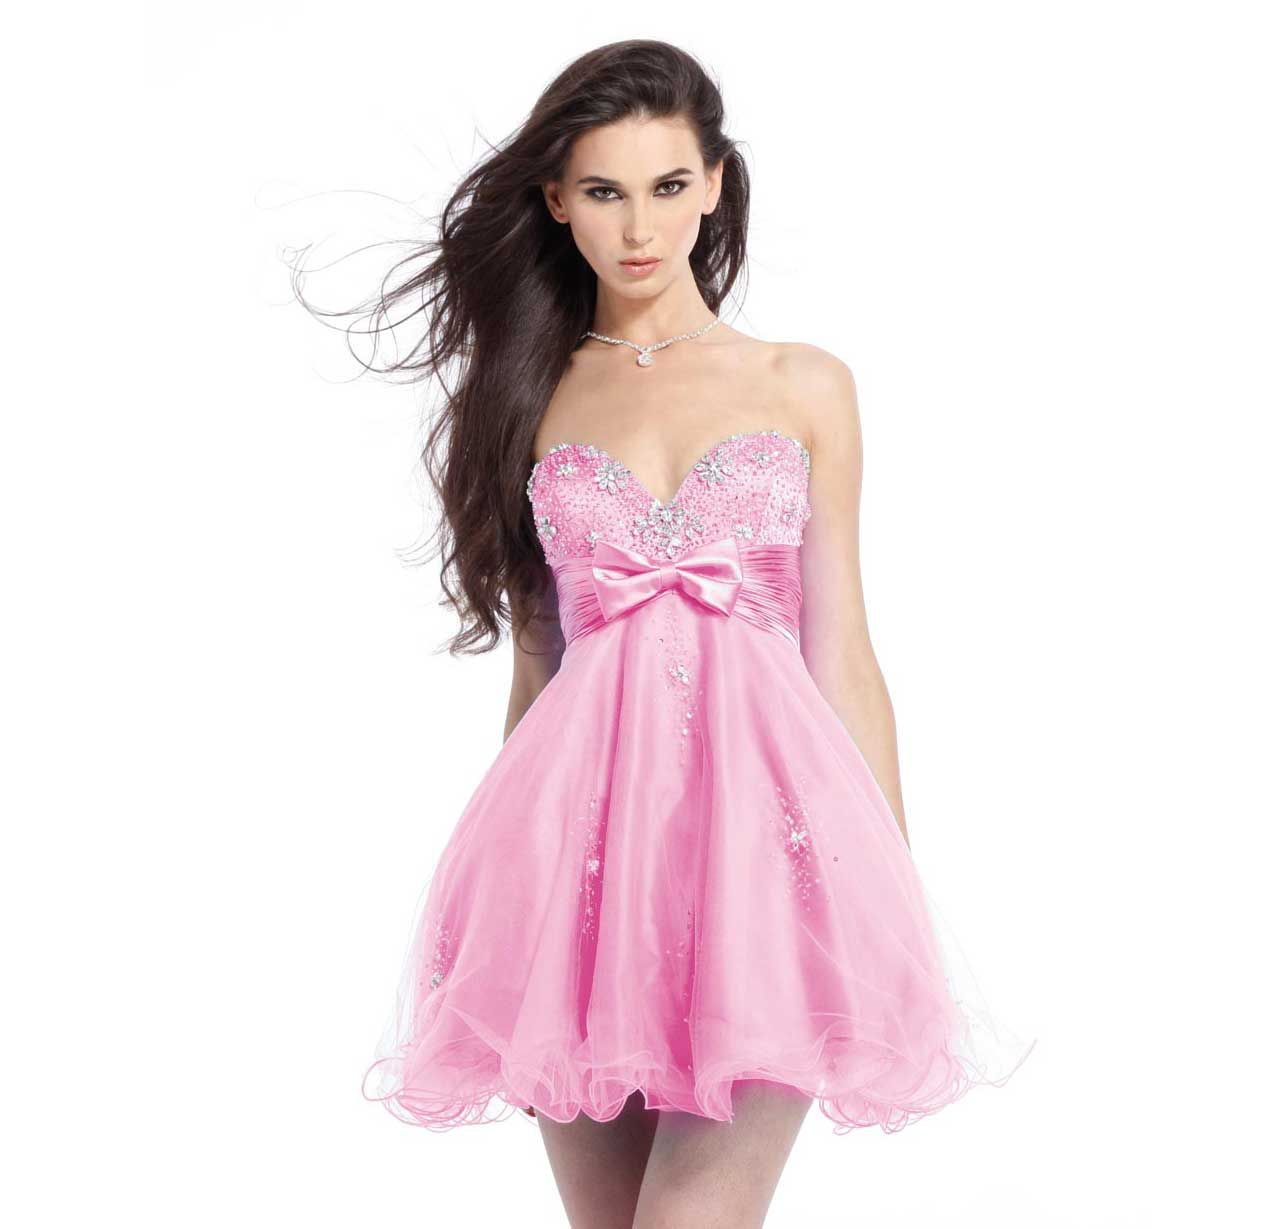 short-pink-wedding-cocktail-prom-dress- | Short Prom Dress ...